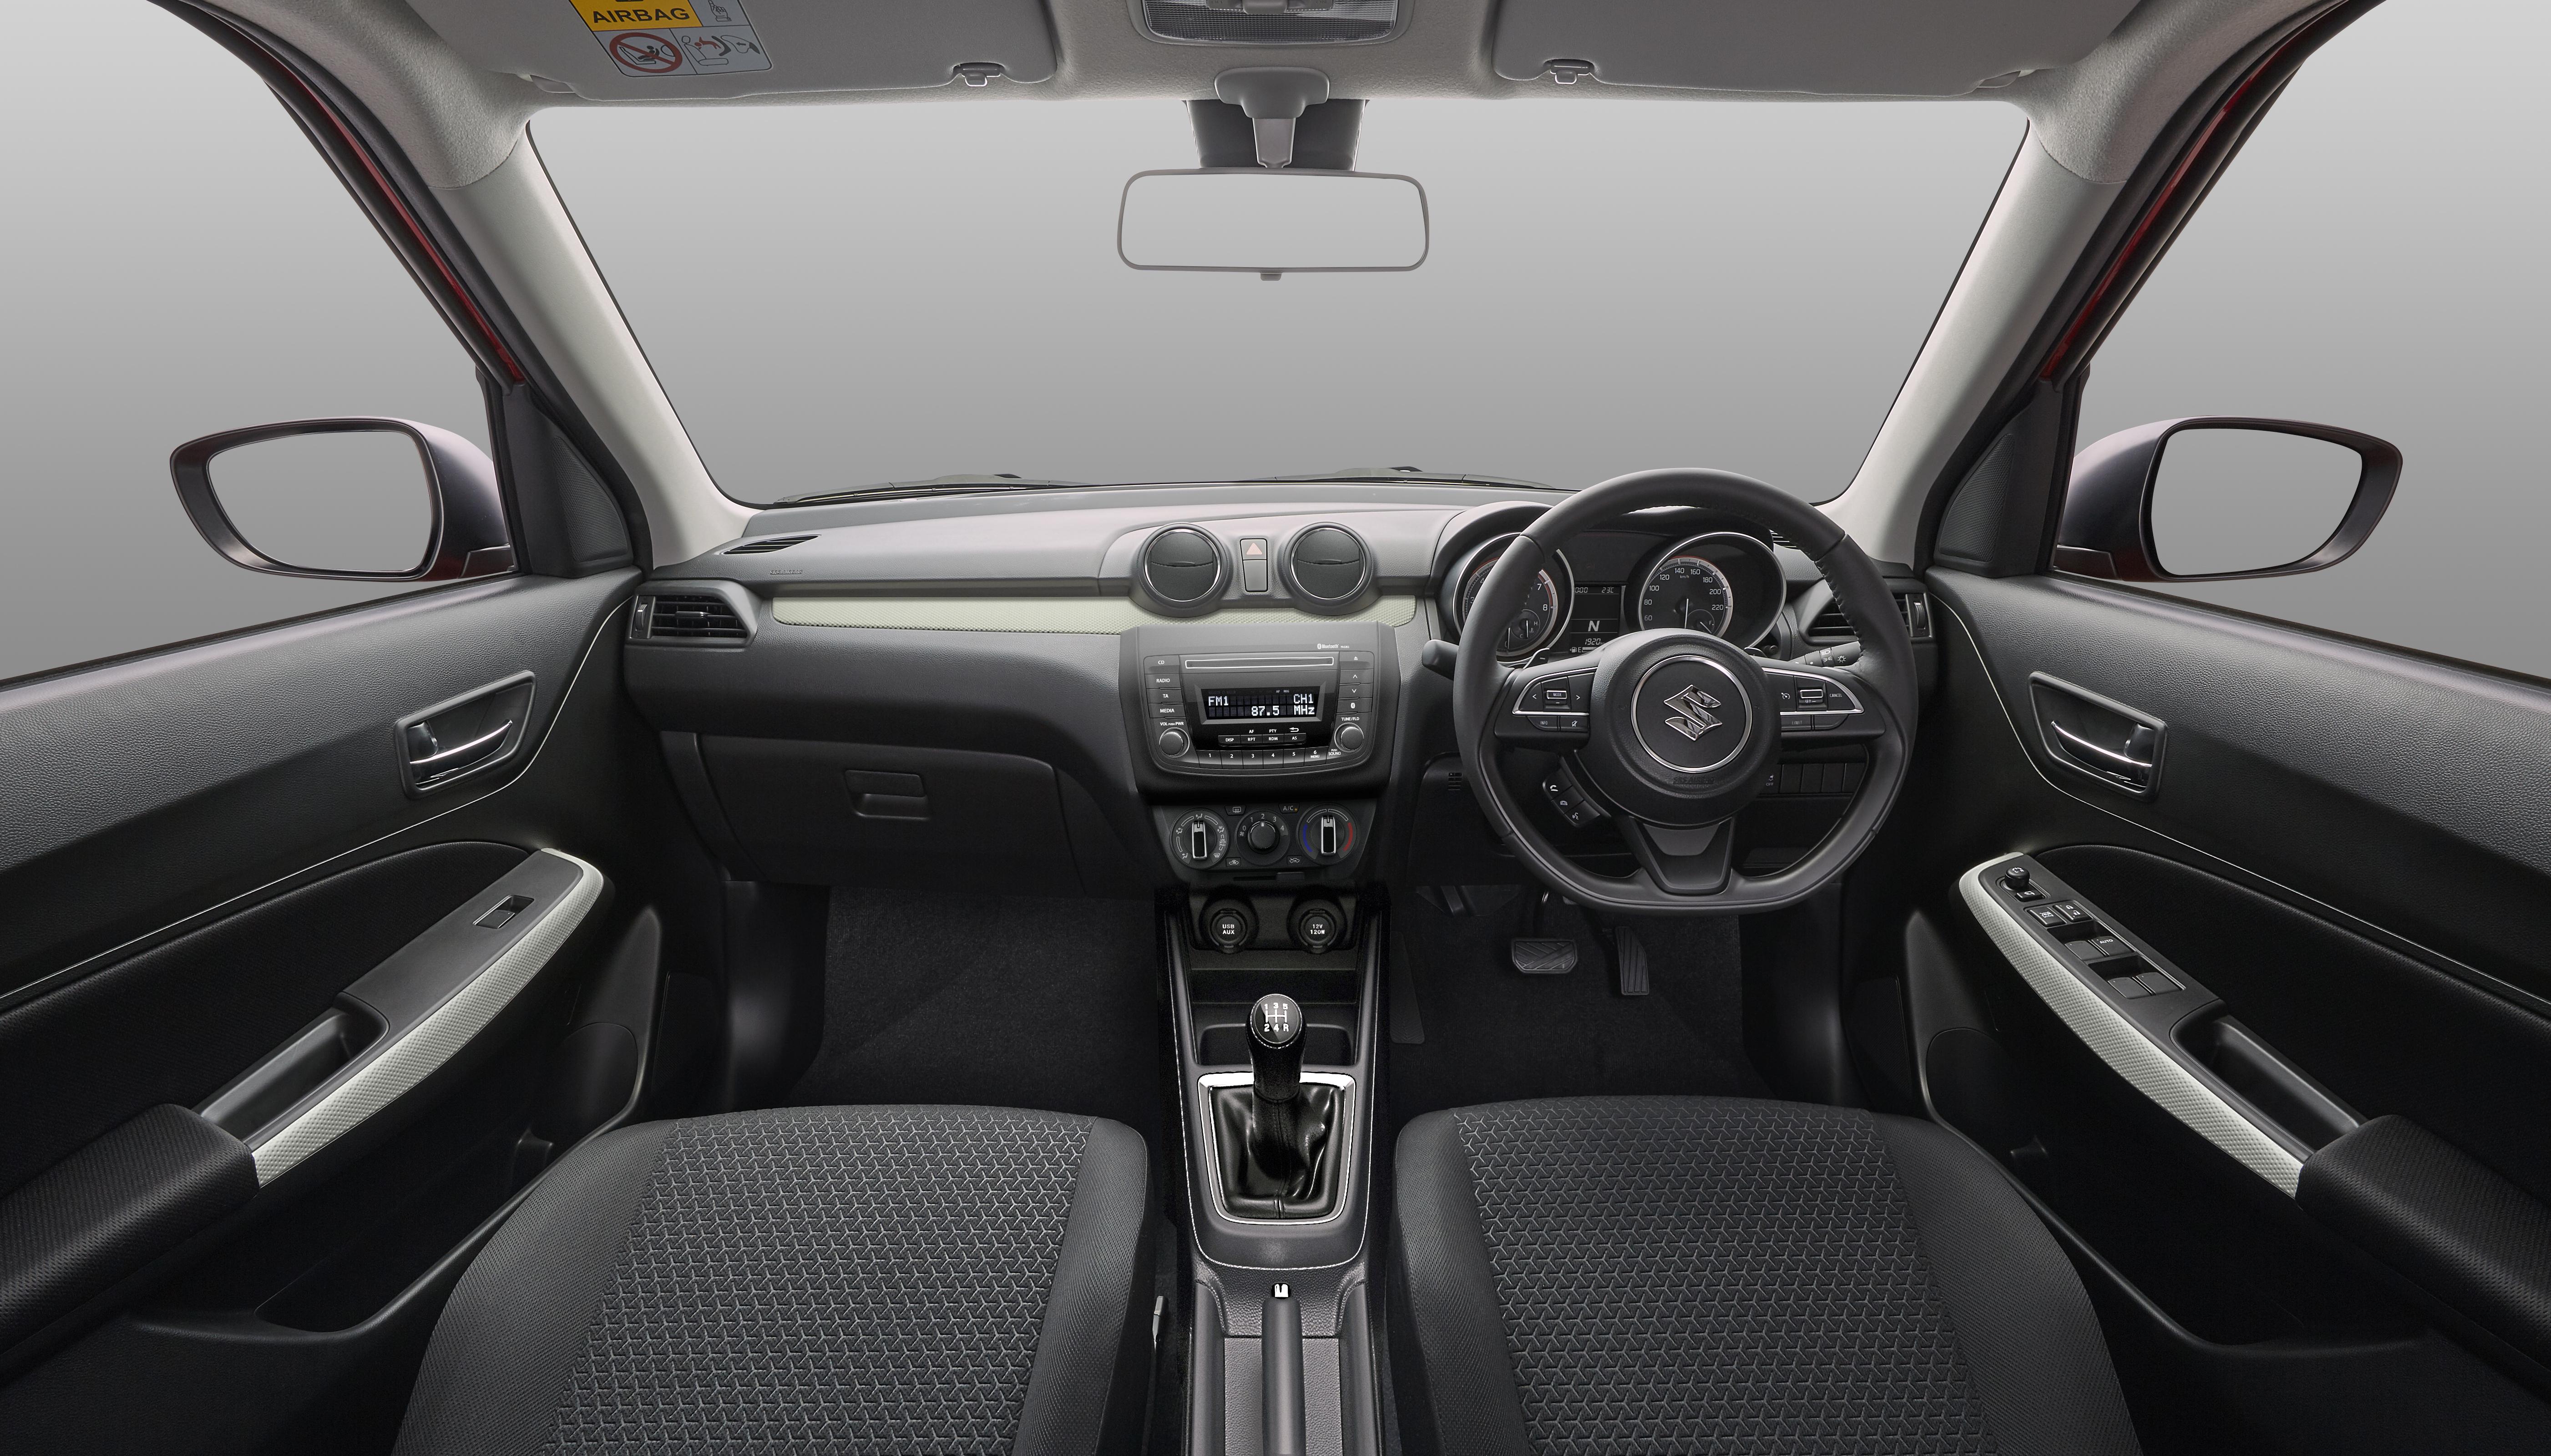 2017 Suzuki Swift GL interior.